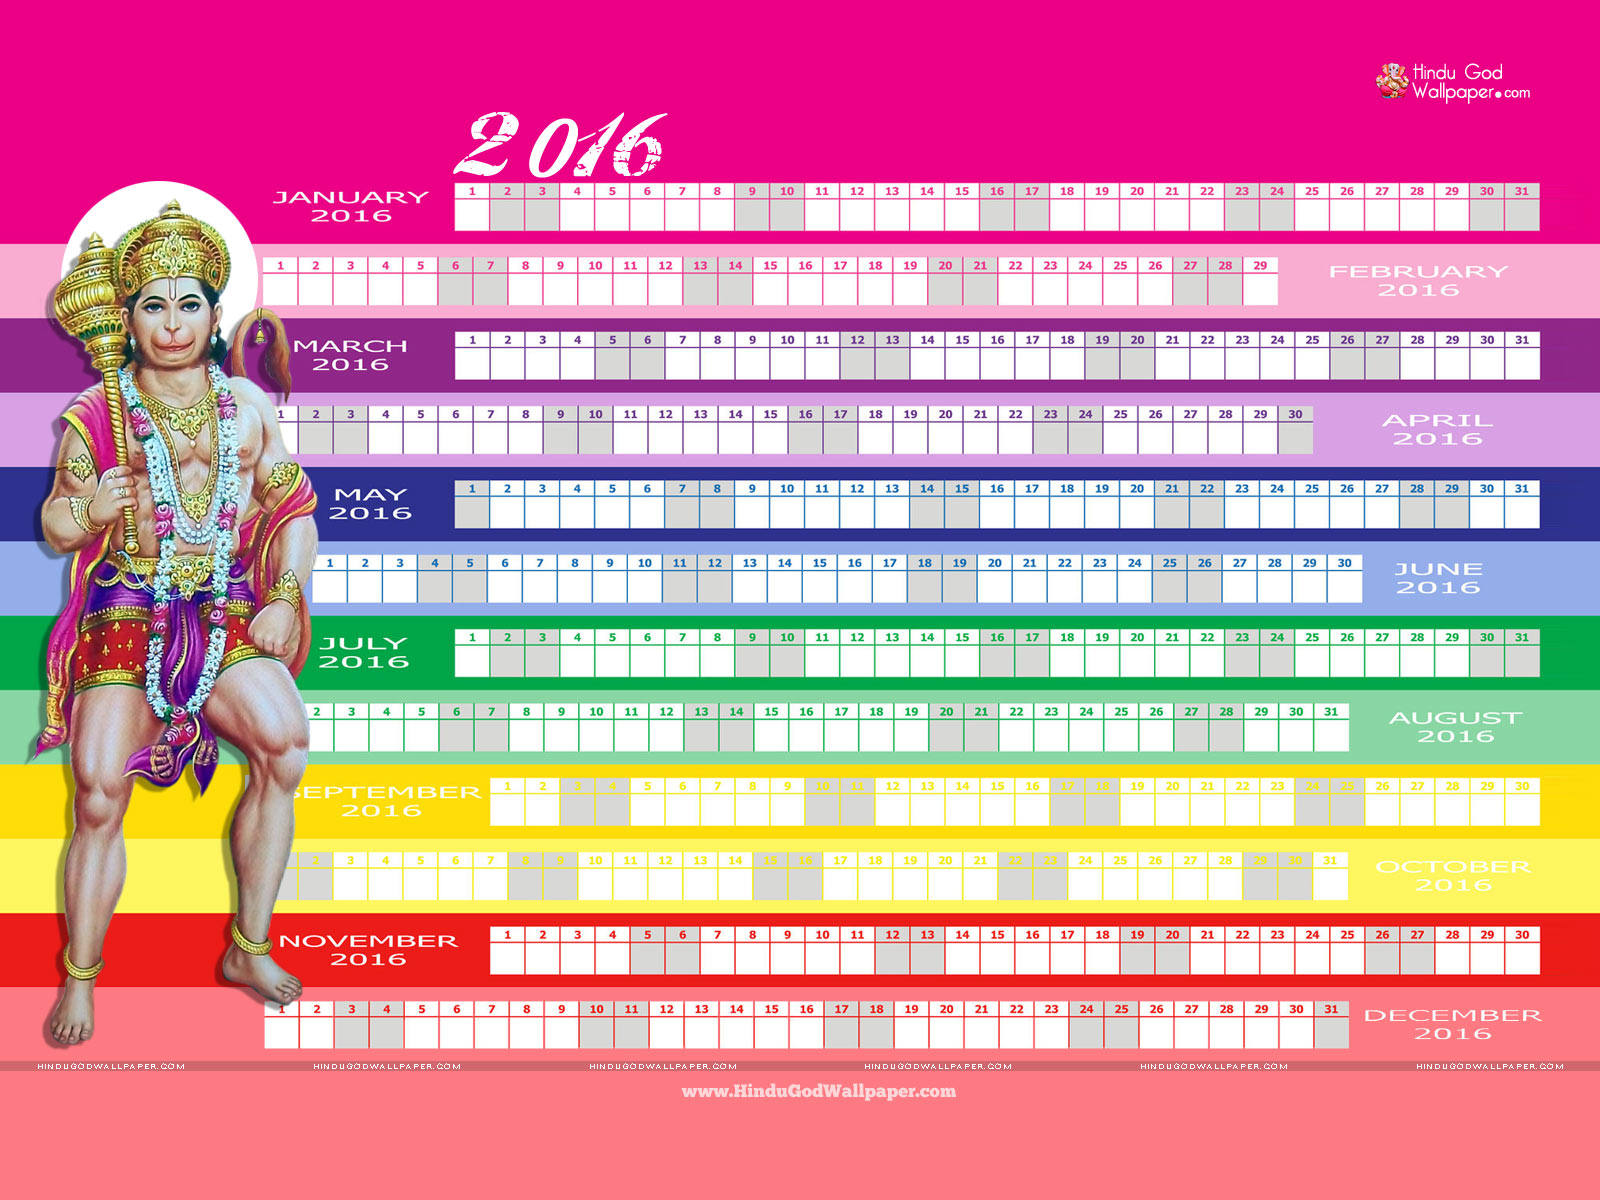 Desktop Wallpaper Calendar 2016 Download 1600x1200